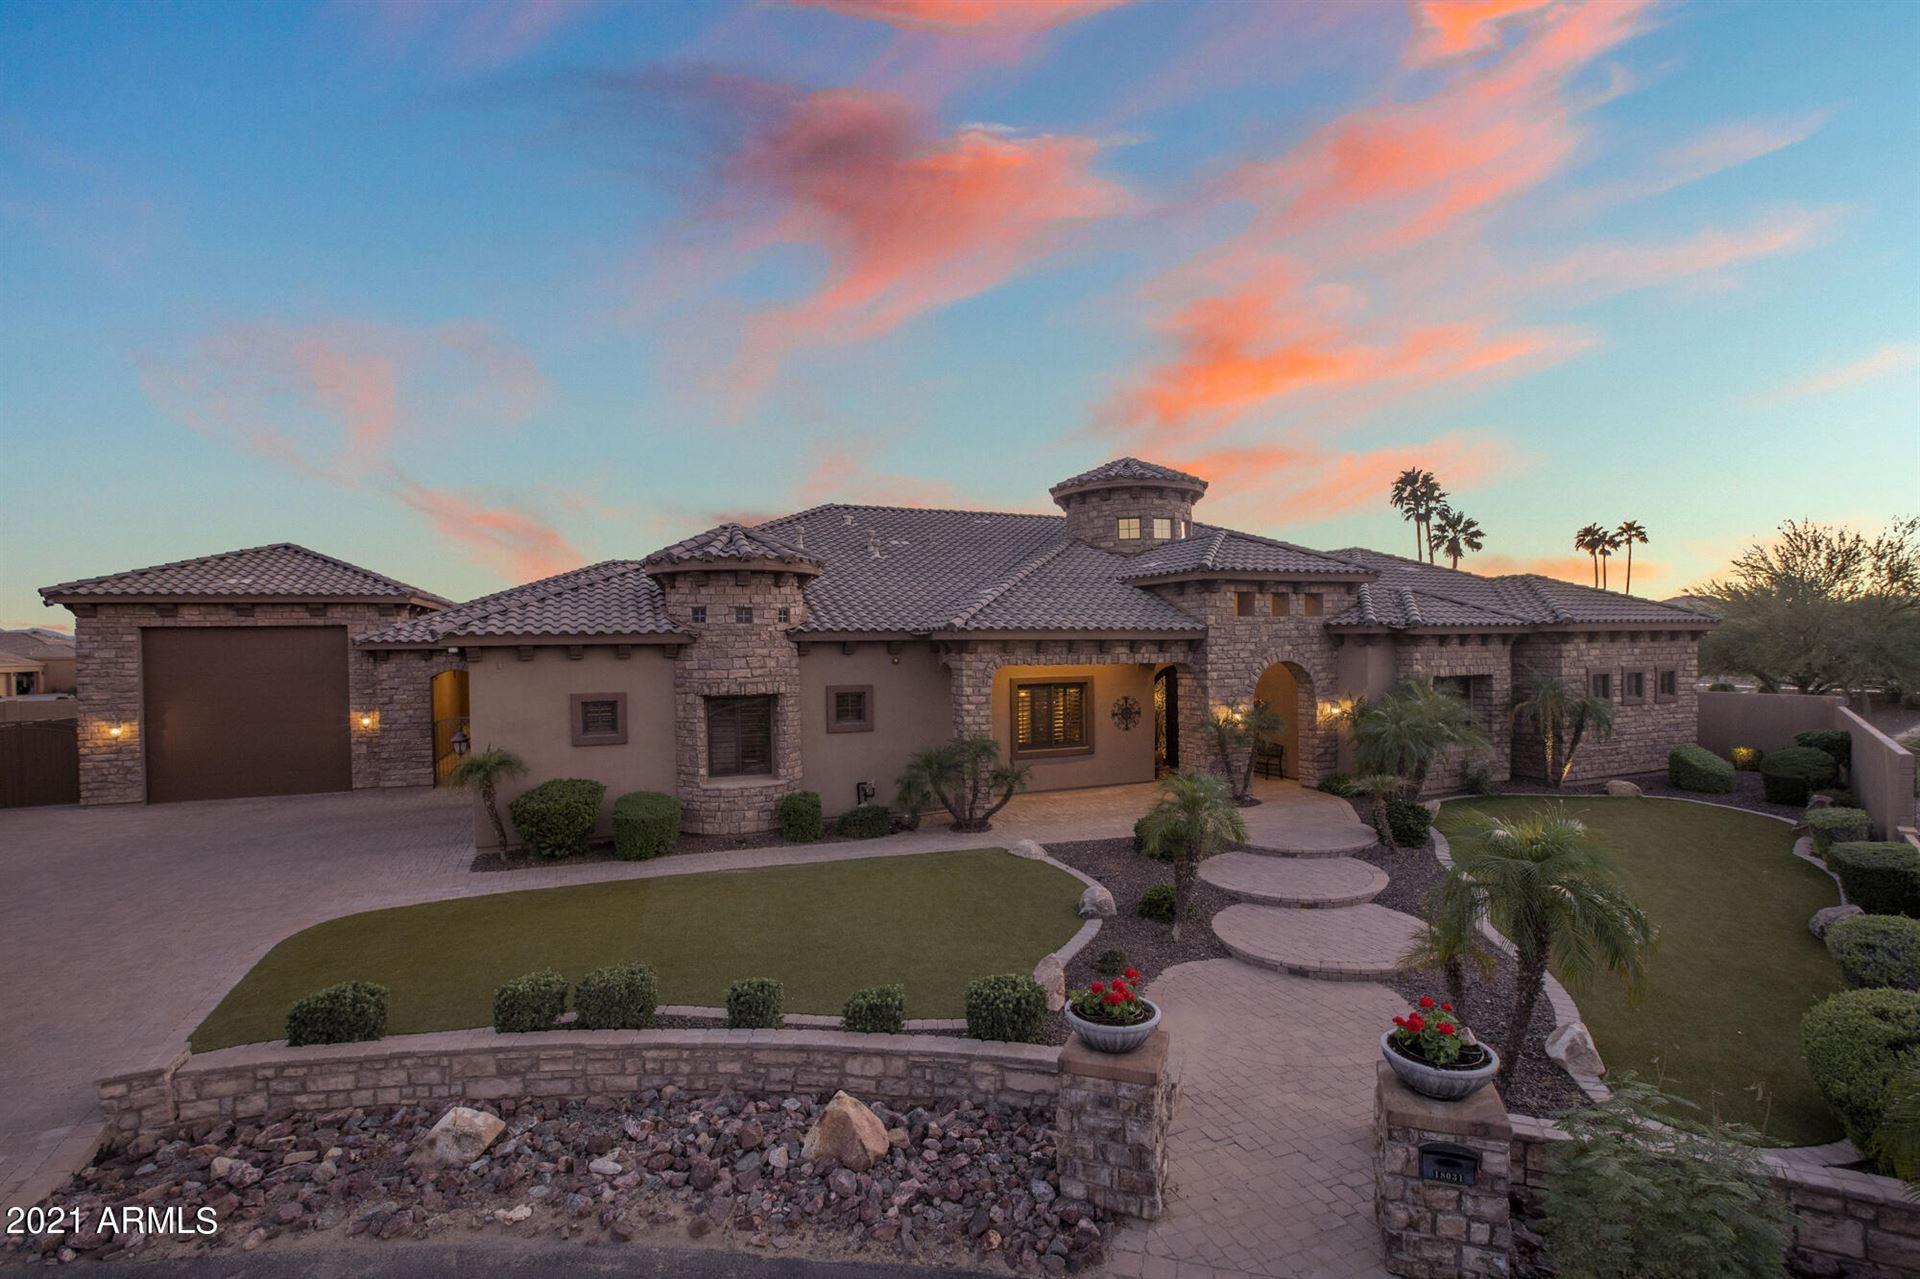 Photo of 18031 W SOLANO Drive, Litchfield Park, AZ 85340 (MLS # 6310239)